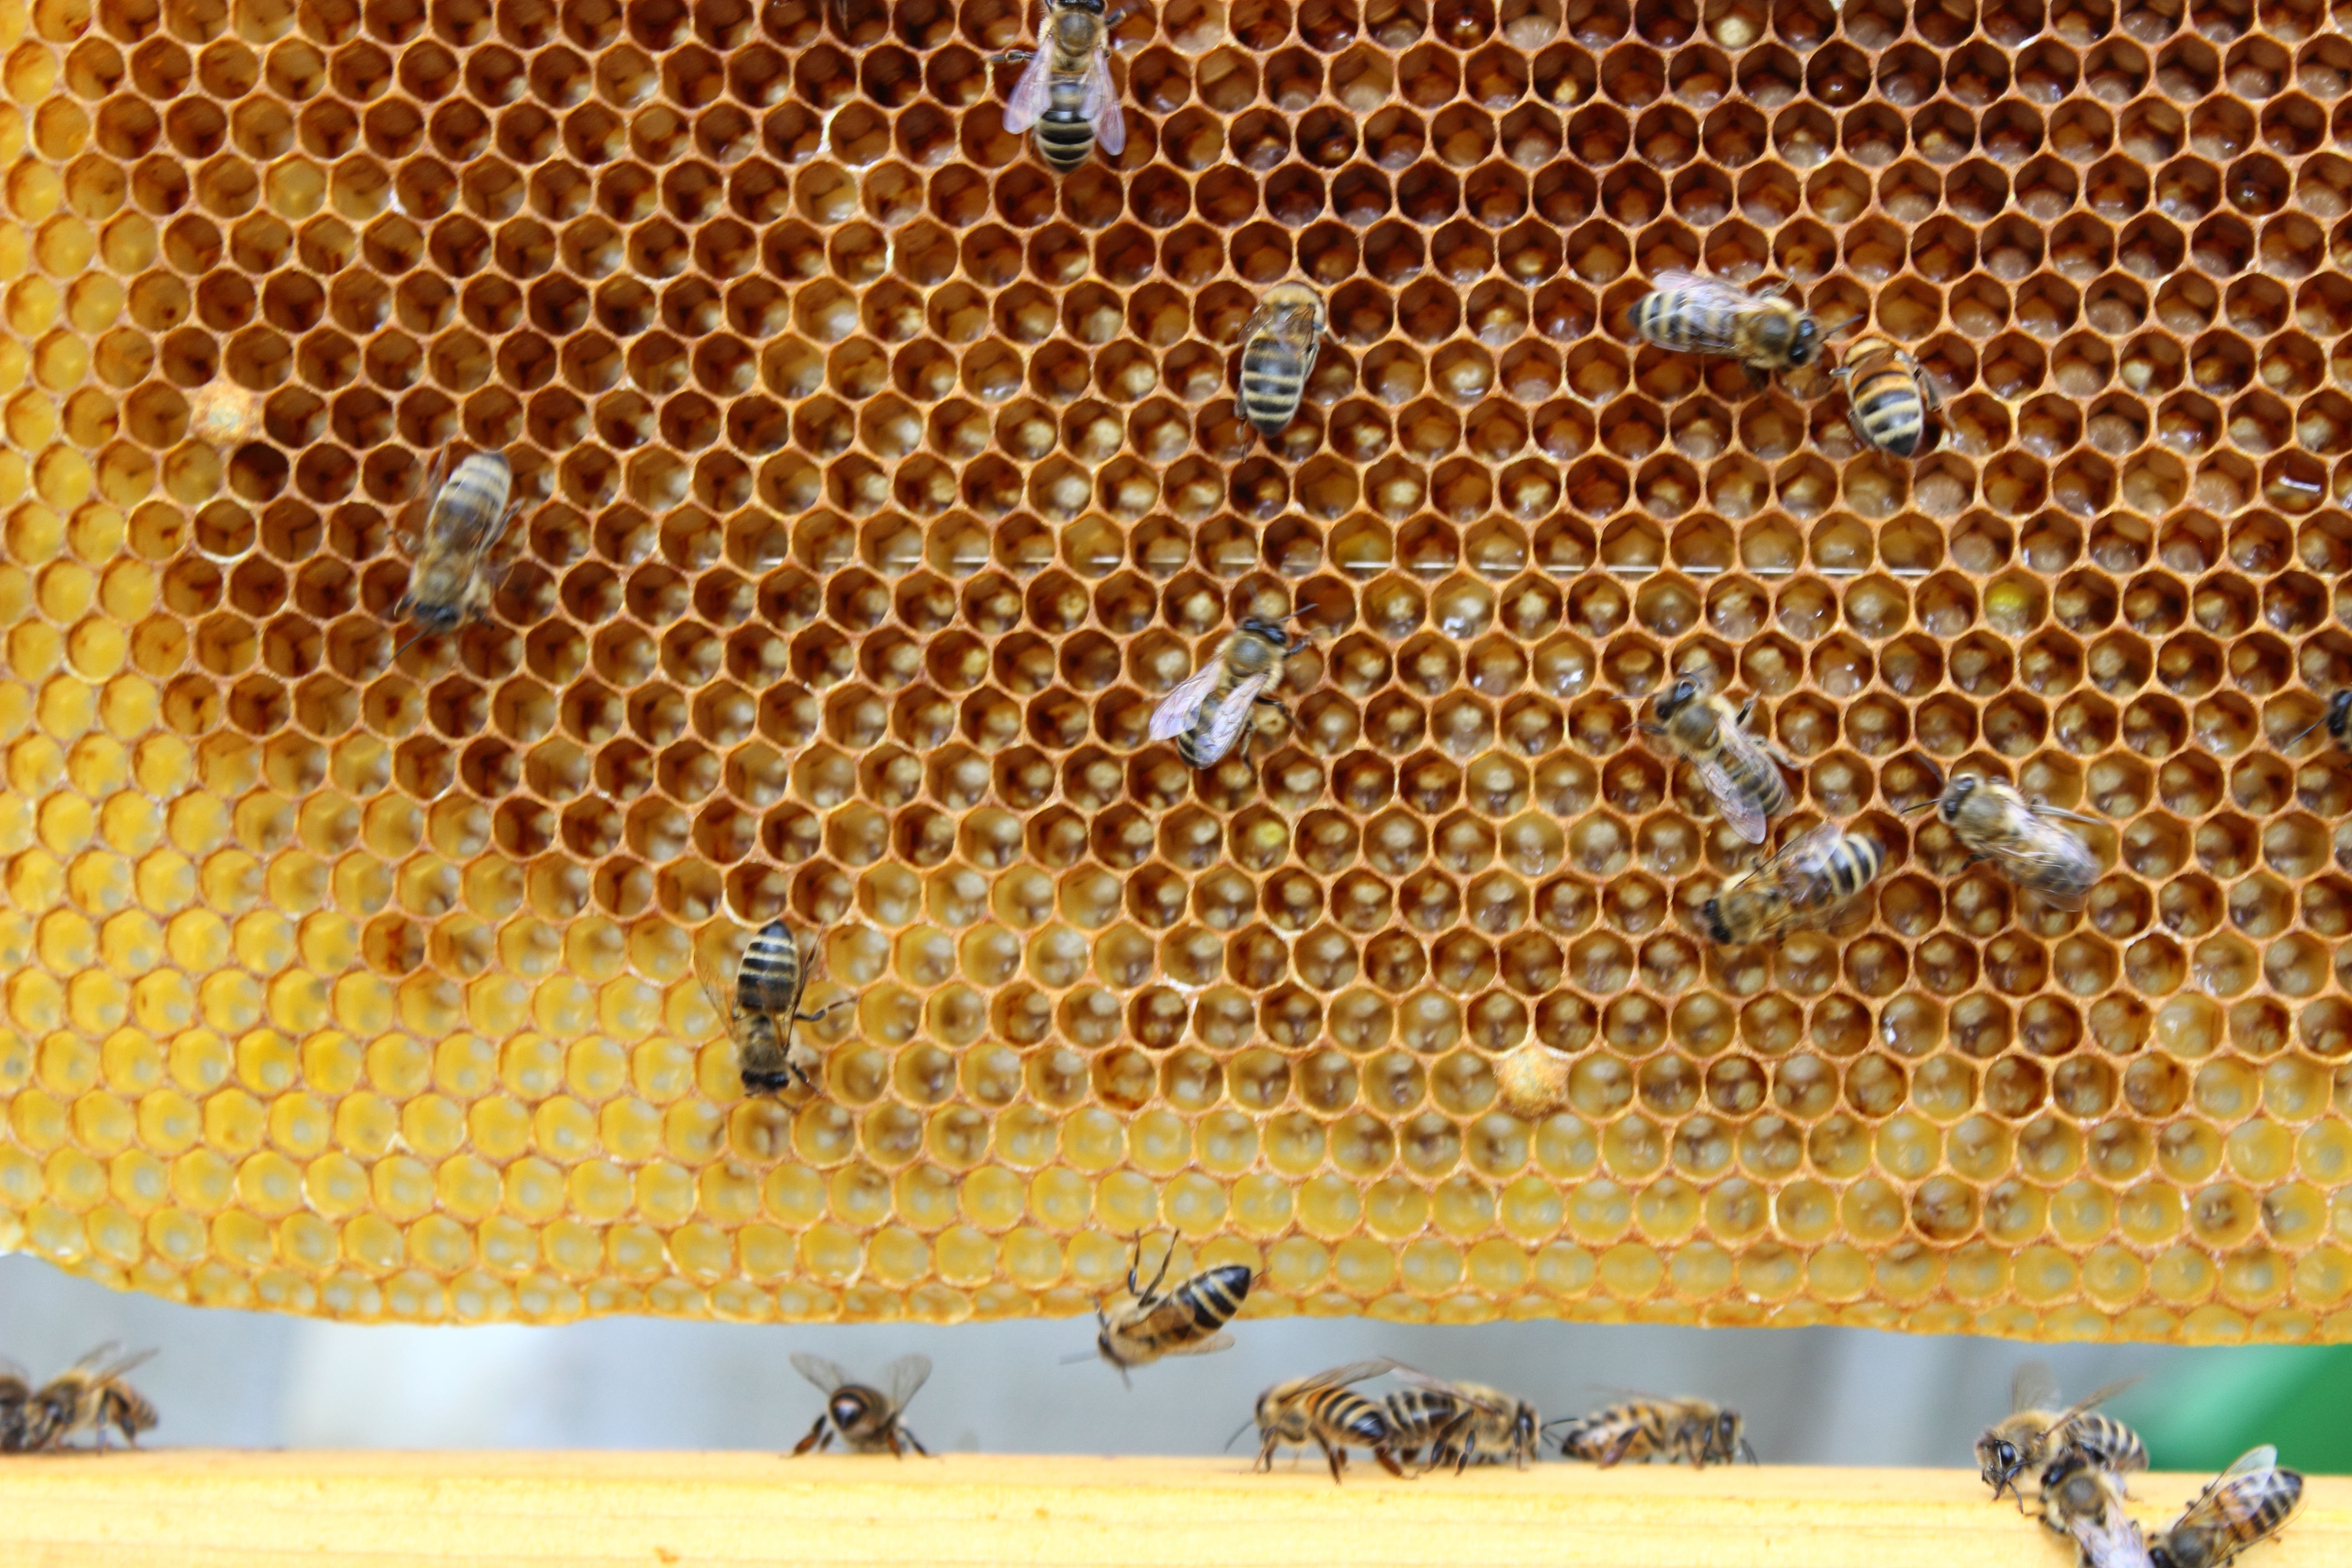 Imkerei Domke Bienen